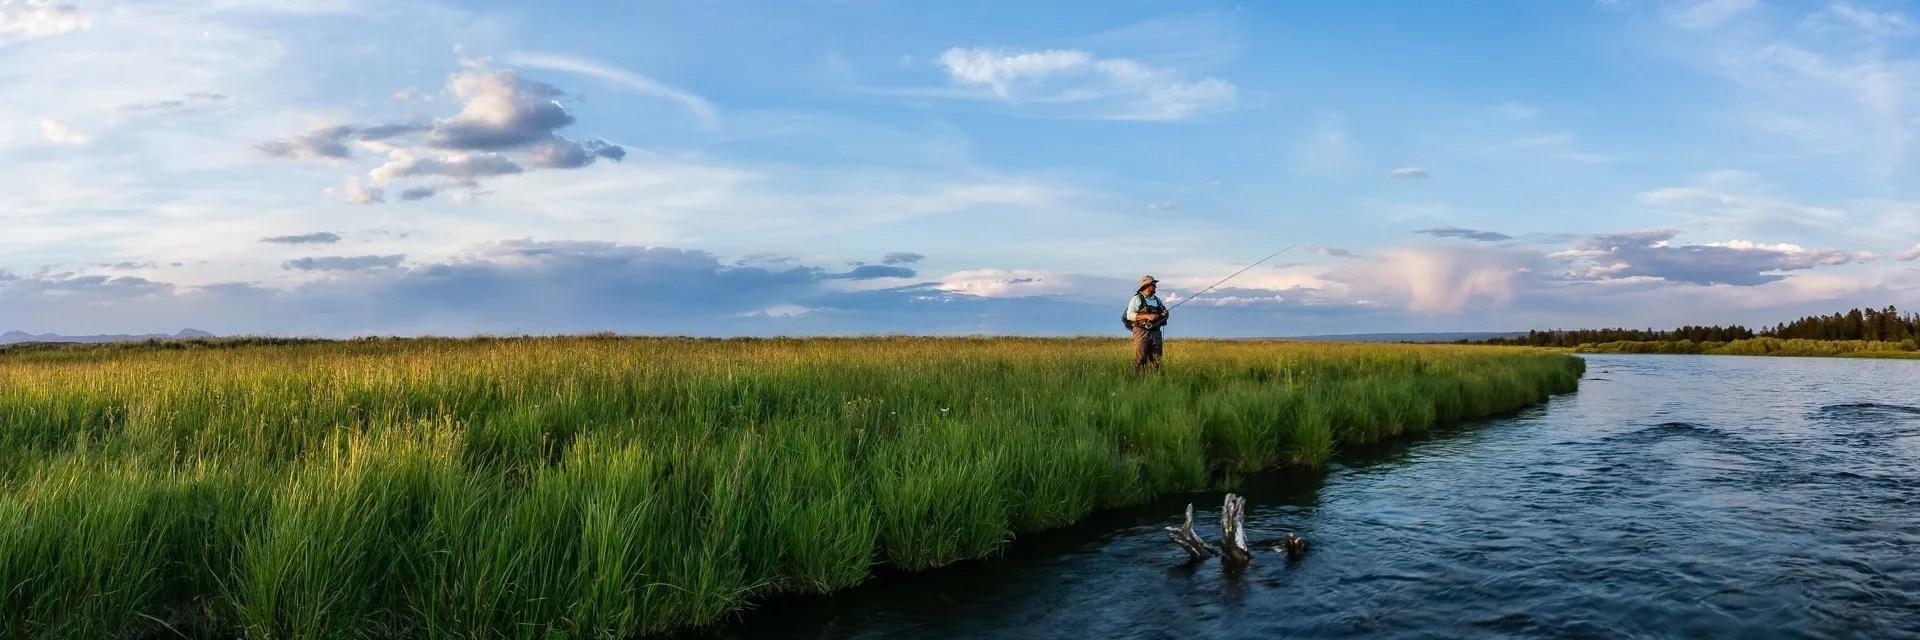 The Wait - Fine Art Panoramic Photography